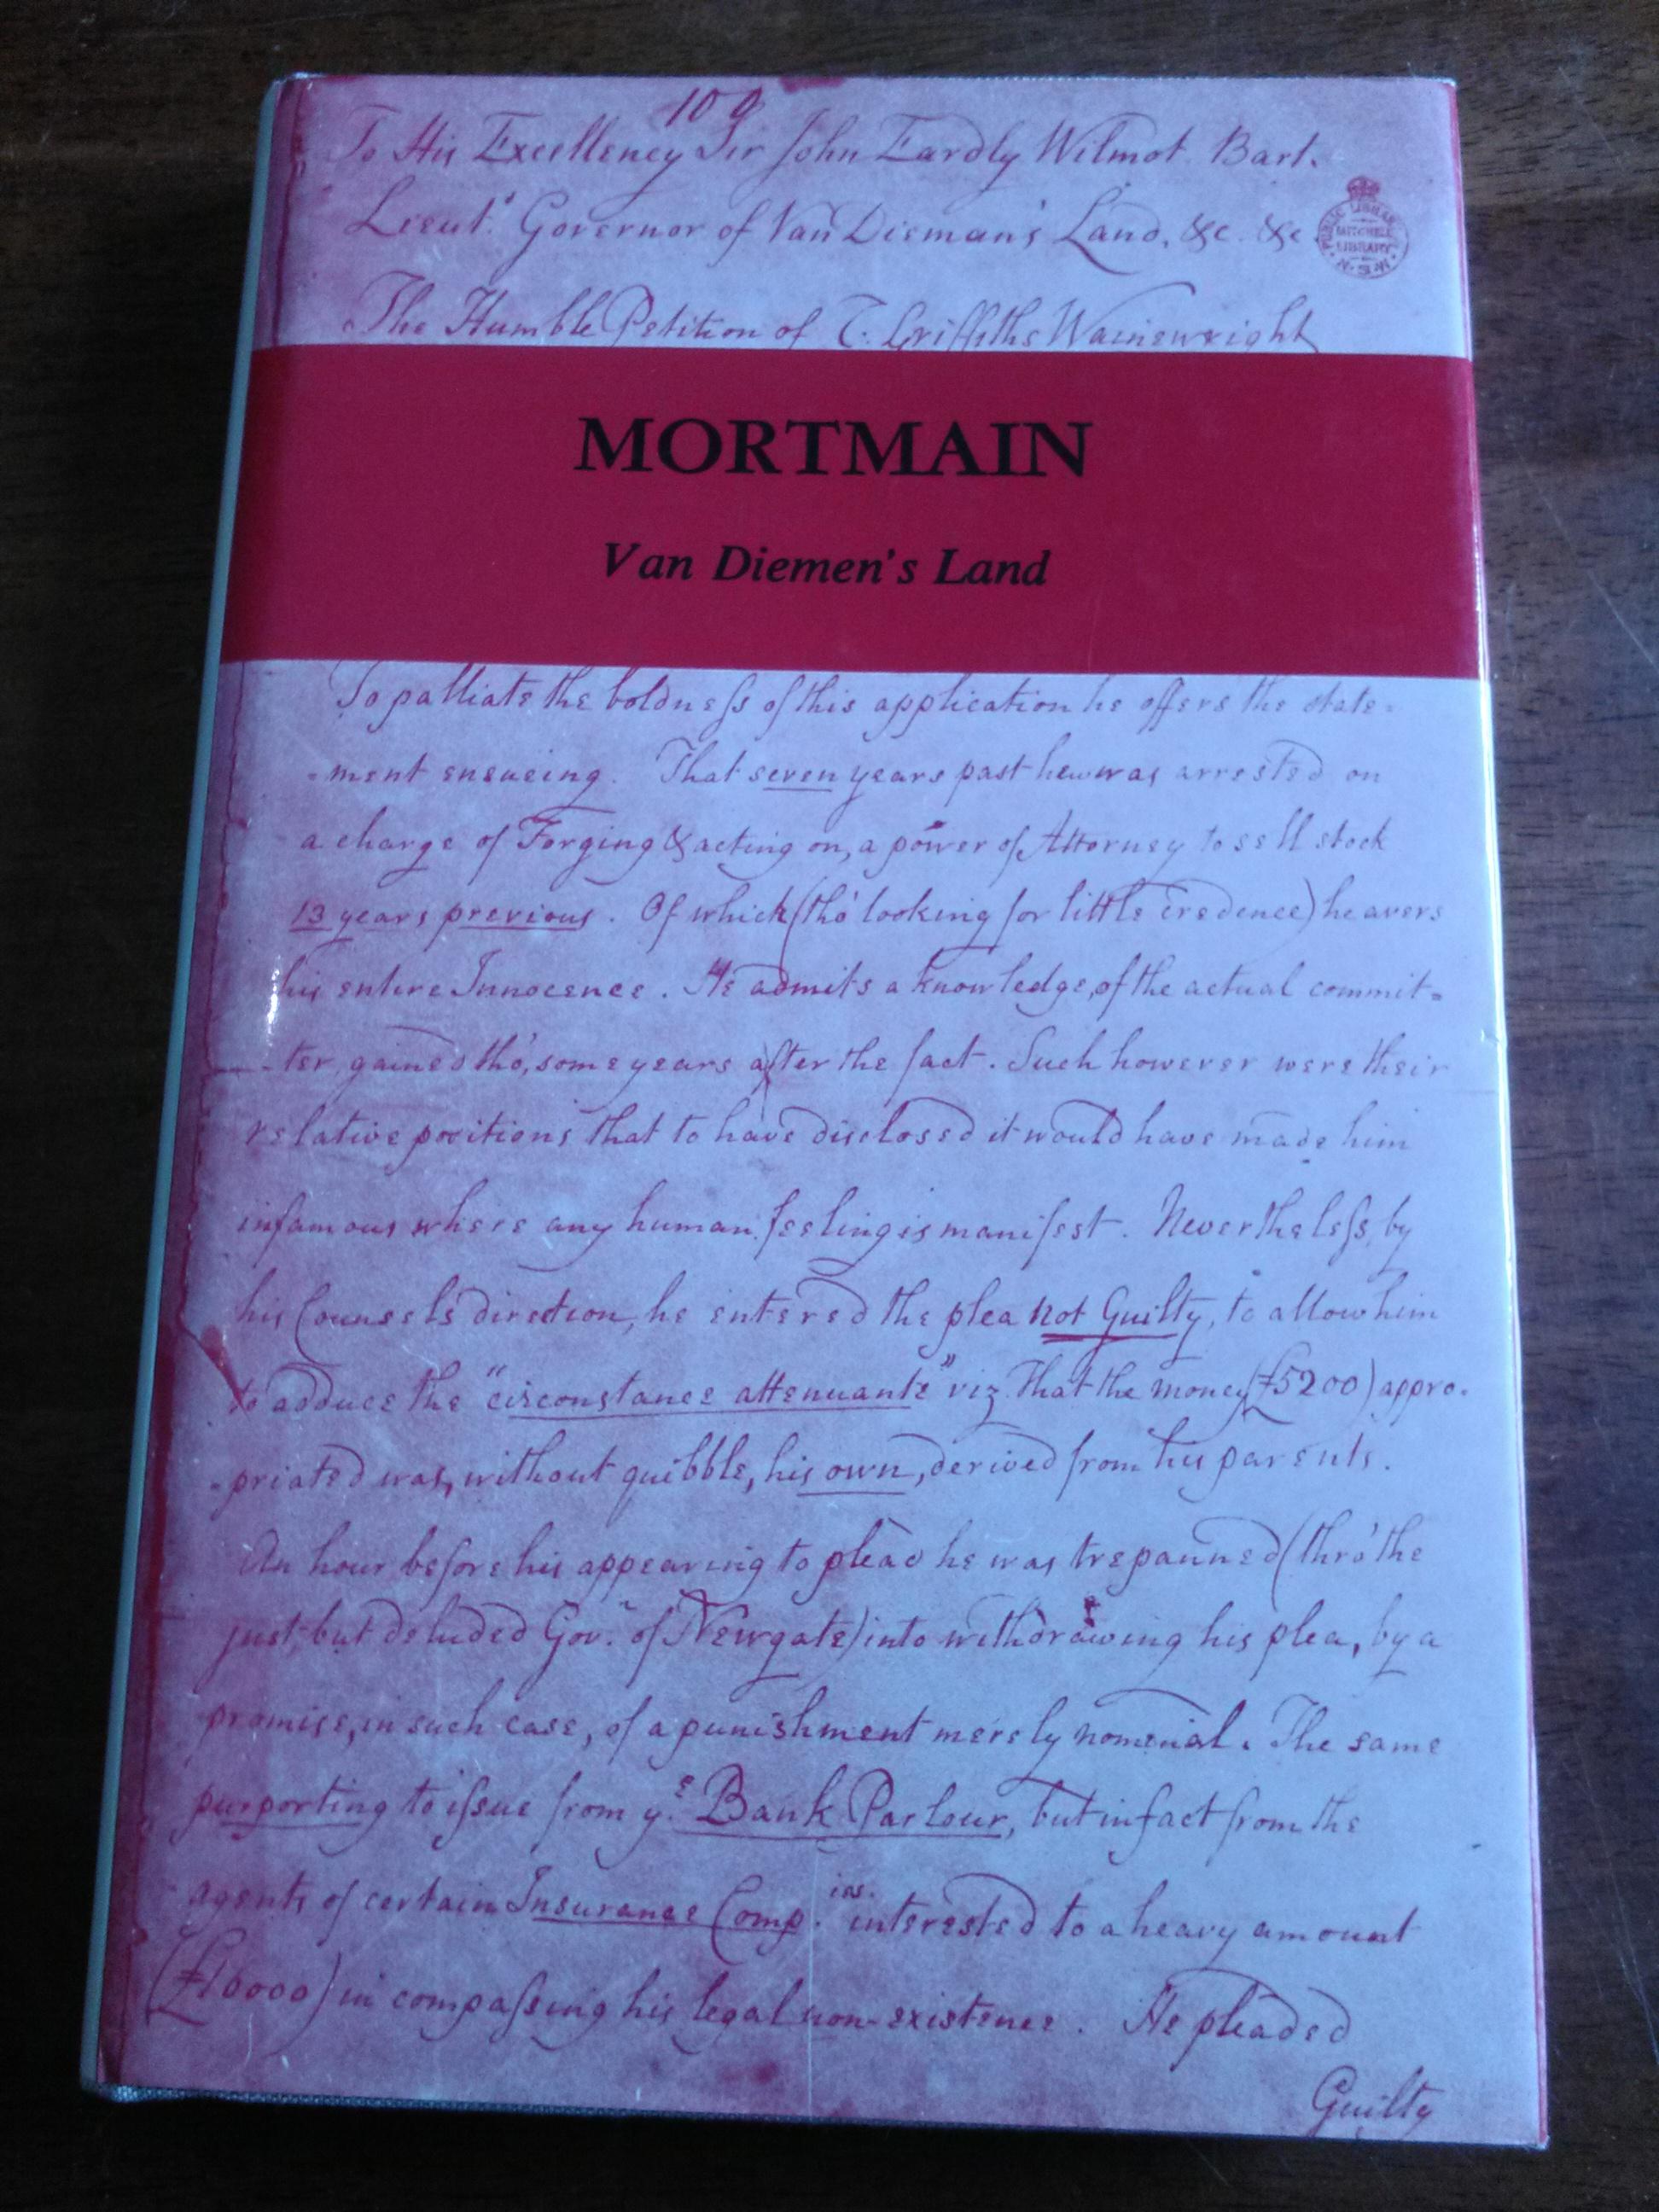 Mortmain - Facsimile collection of documents from Van Diemen's Land convict colony